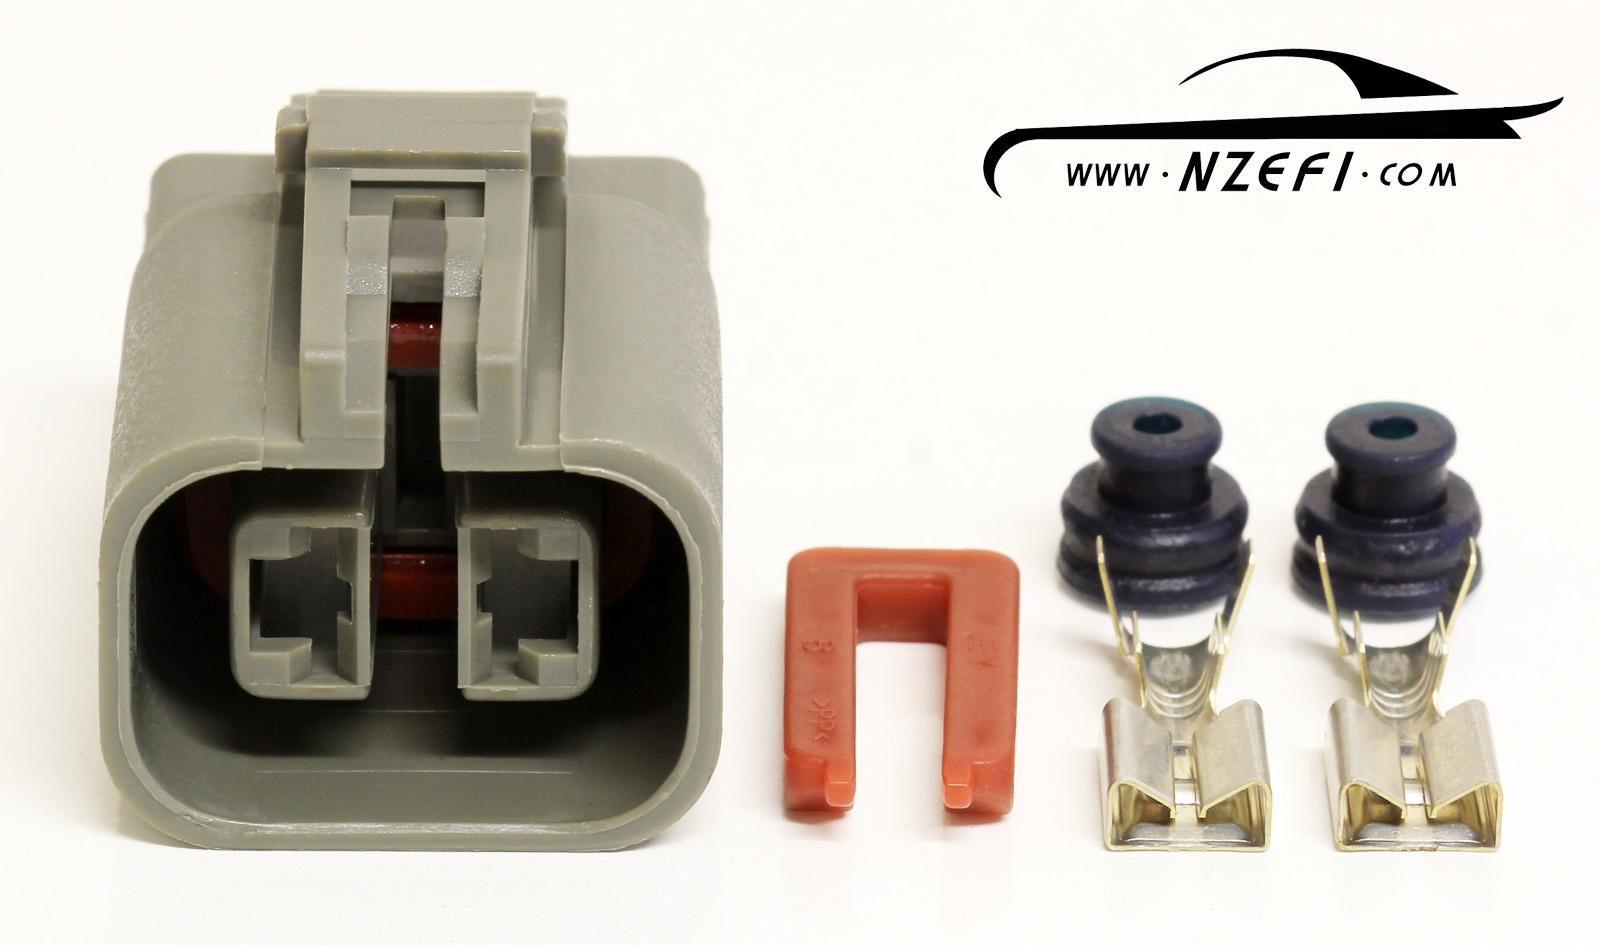 common 2 pin alternator connector suits nissan, mazda, mistubishi2 pin alternator connector common nissan etc (hitachi and mitsubishi branded alternators)